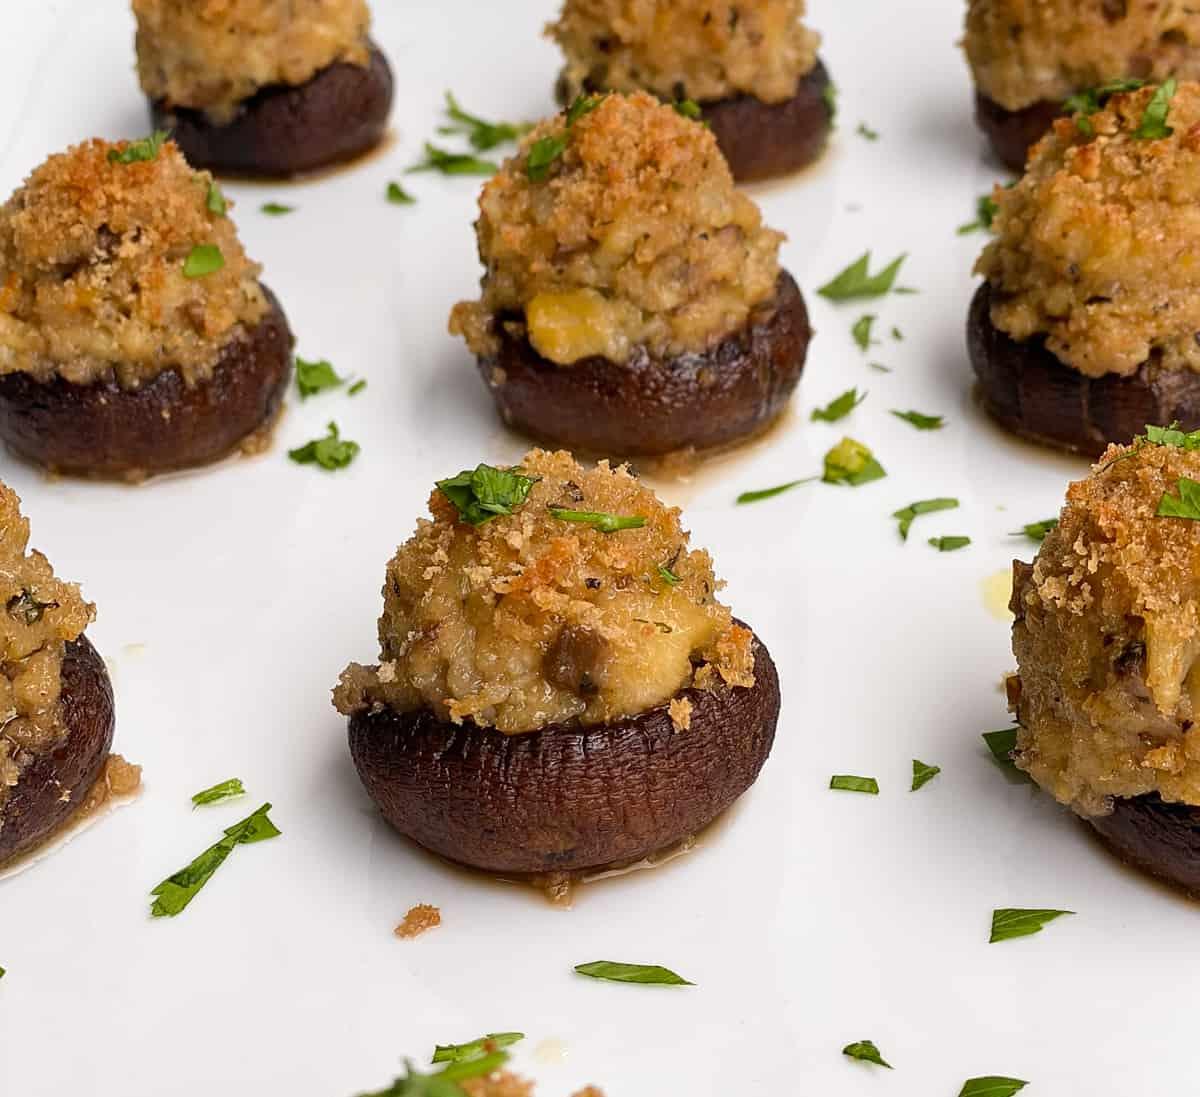 mini Italian mushrooms stuffed with breadcrumbs clams and seasoning on a white plate.